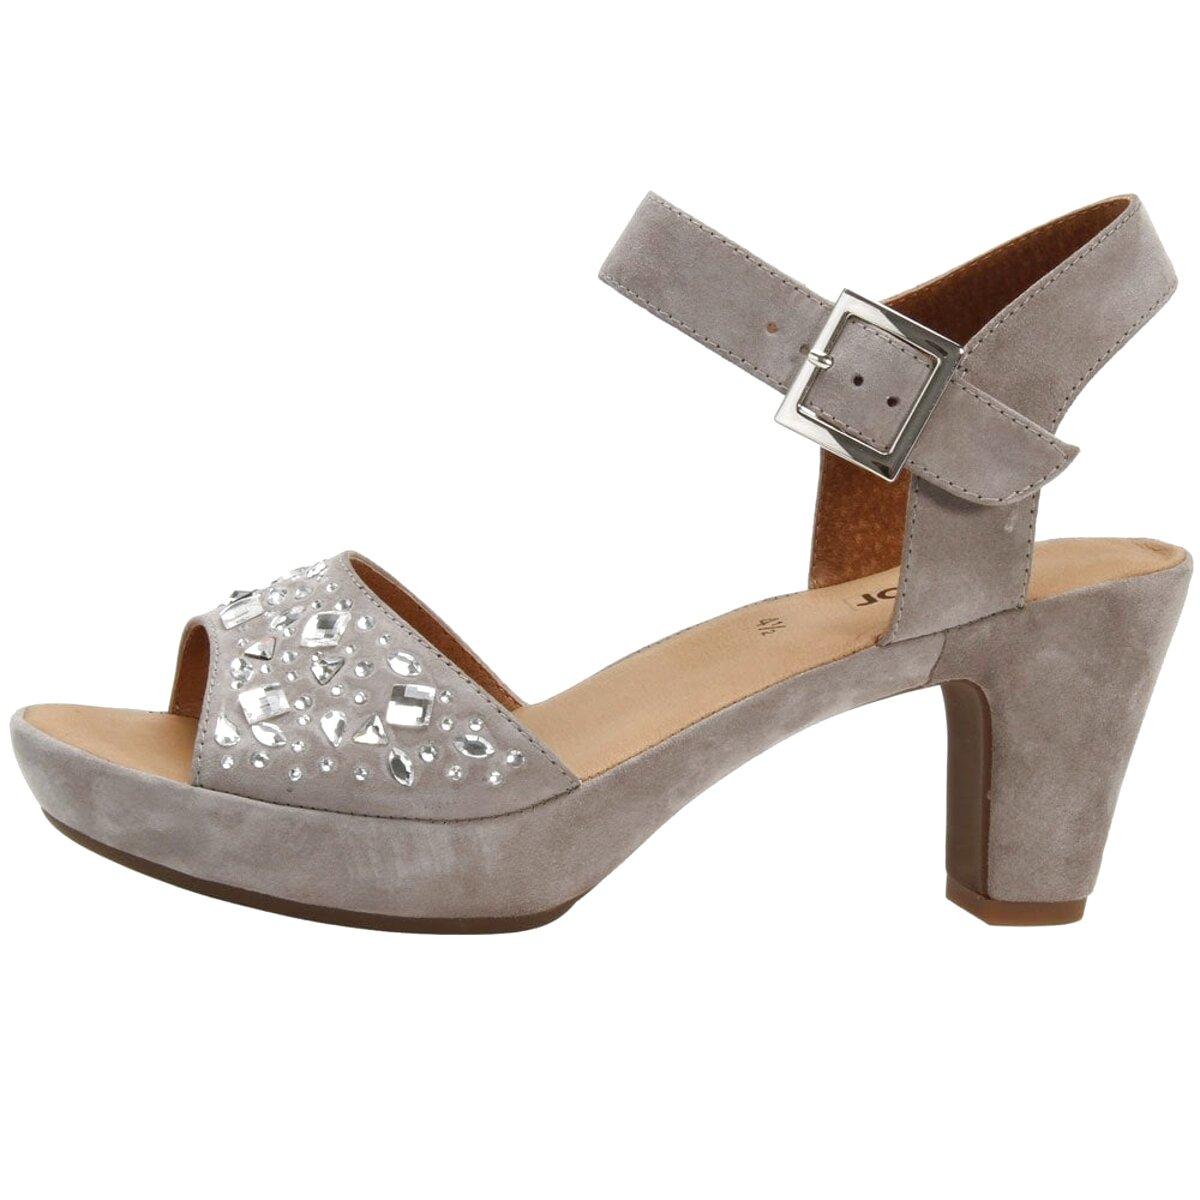 gabor shoes sandals for sale